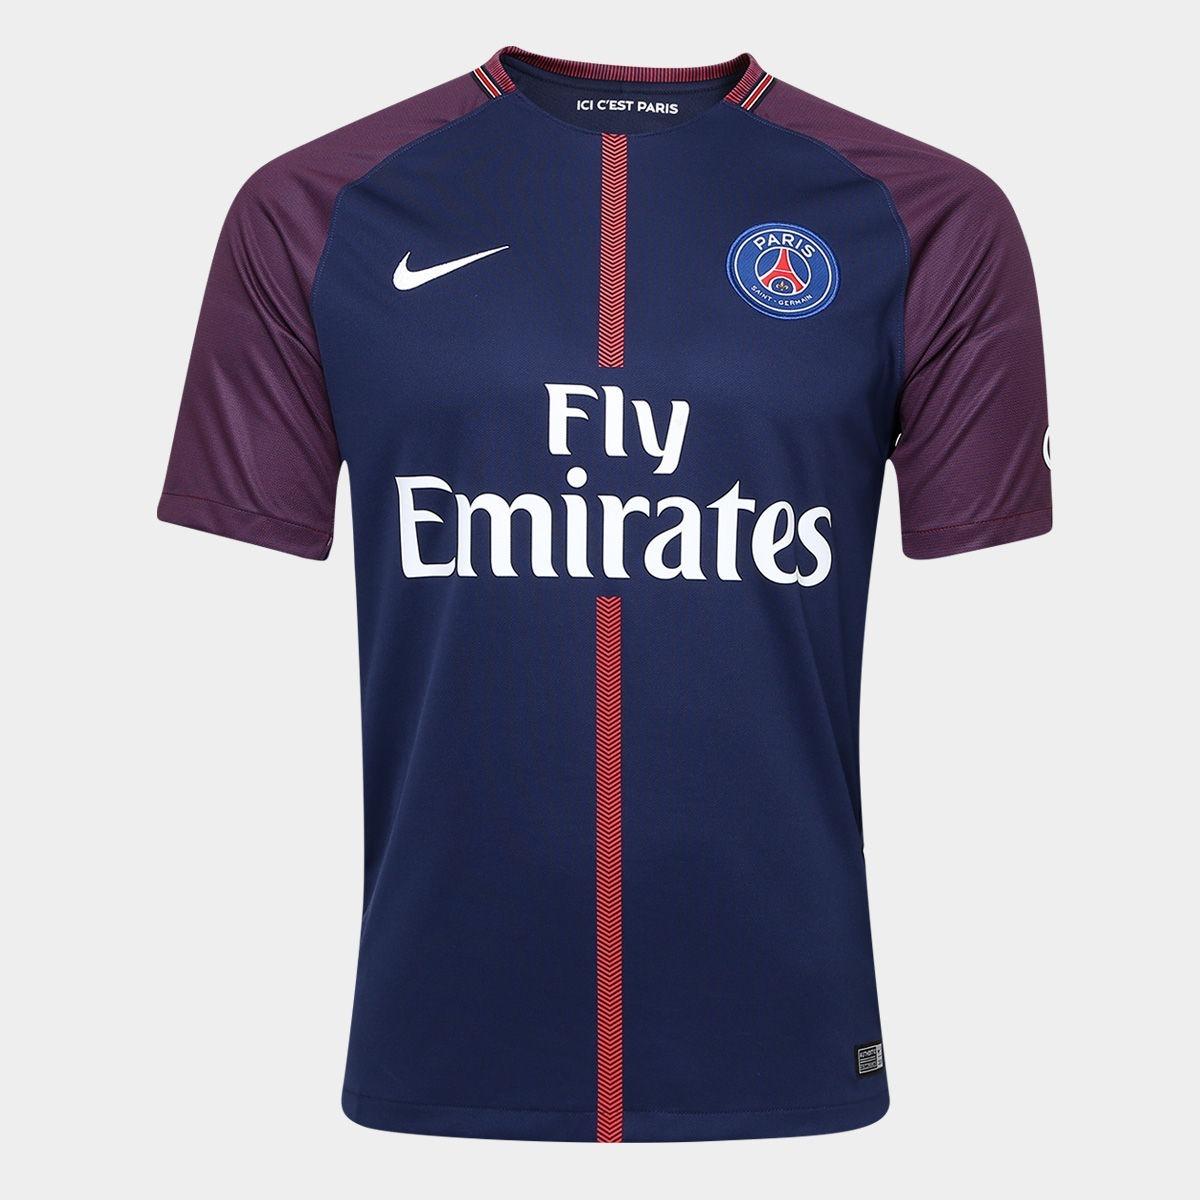 camisa nike paris saint germain home 2018 n° 10 - neymar jr. Carregando  zoom. 34fb1111e1655